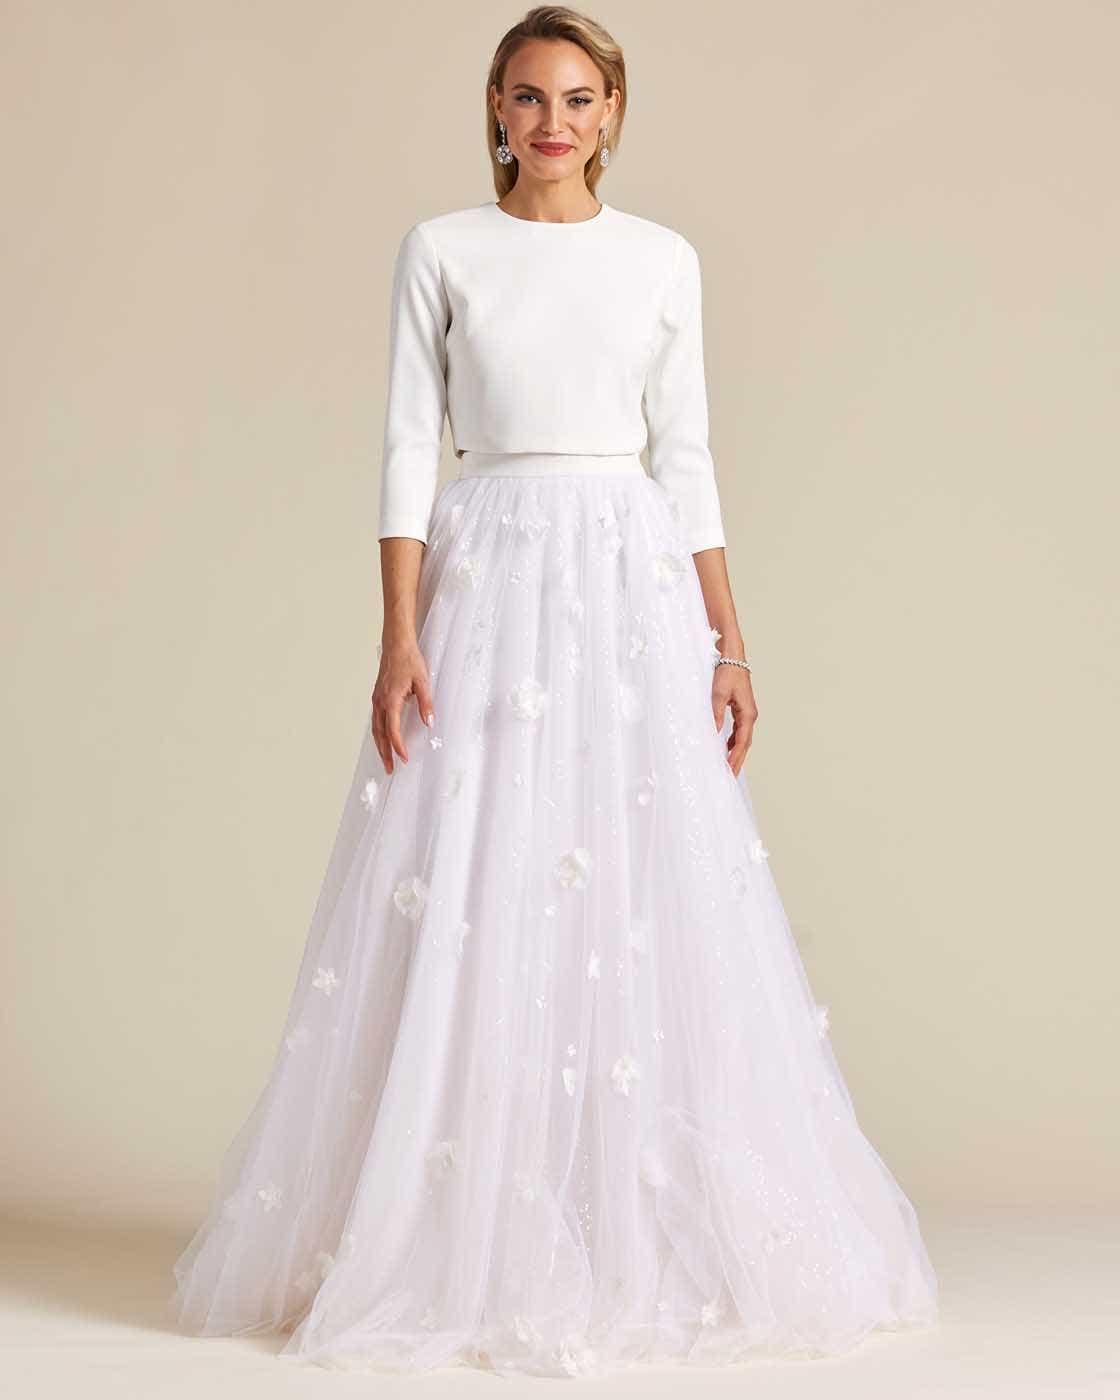 Minimal Style White Two Piece Wedding Dress - Front